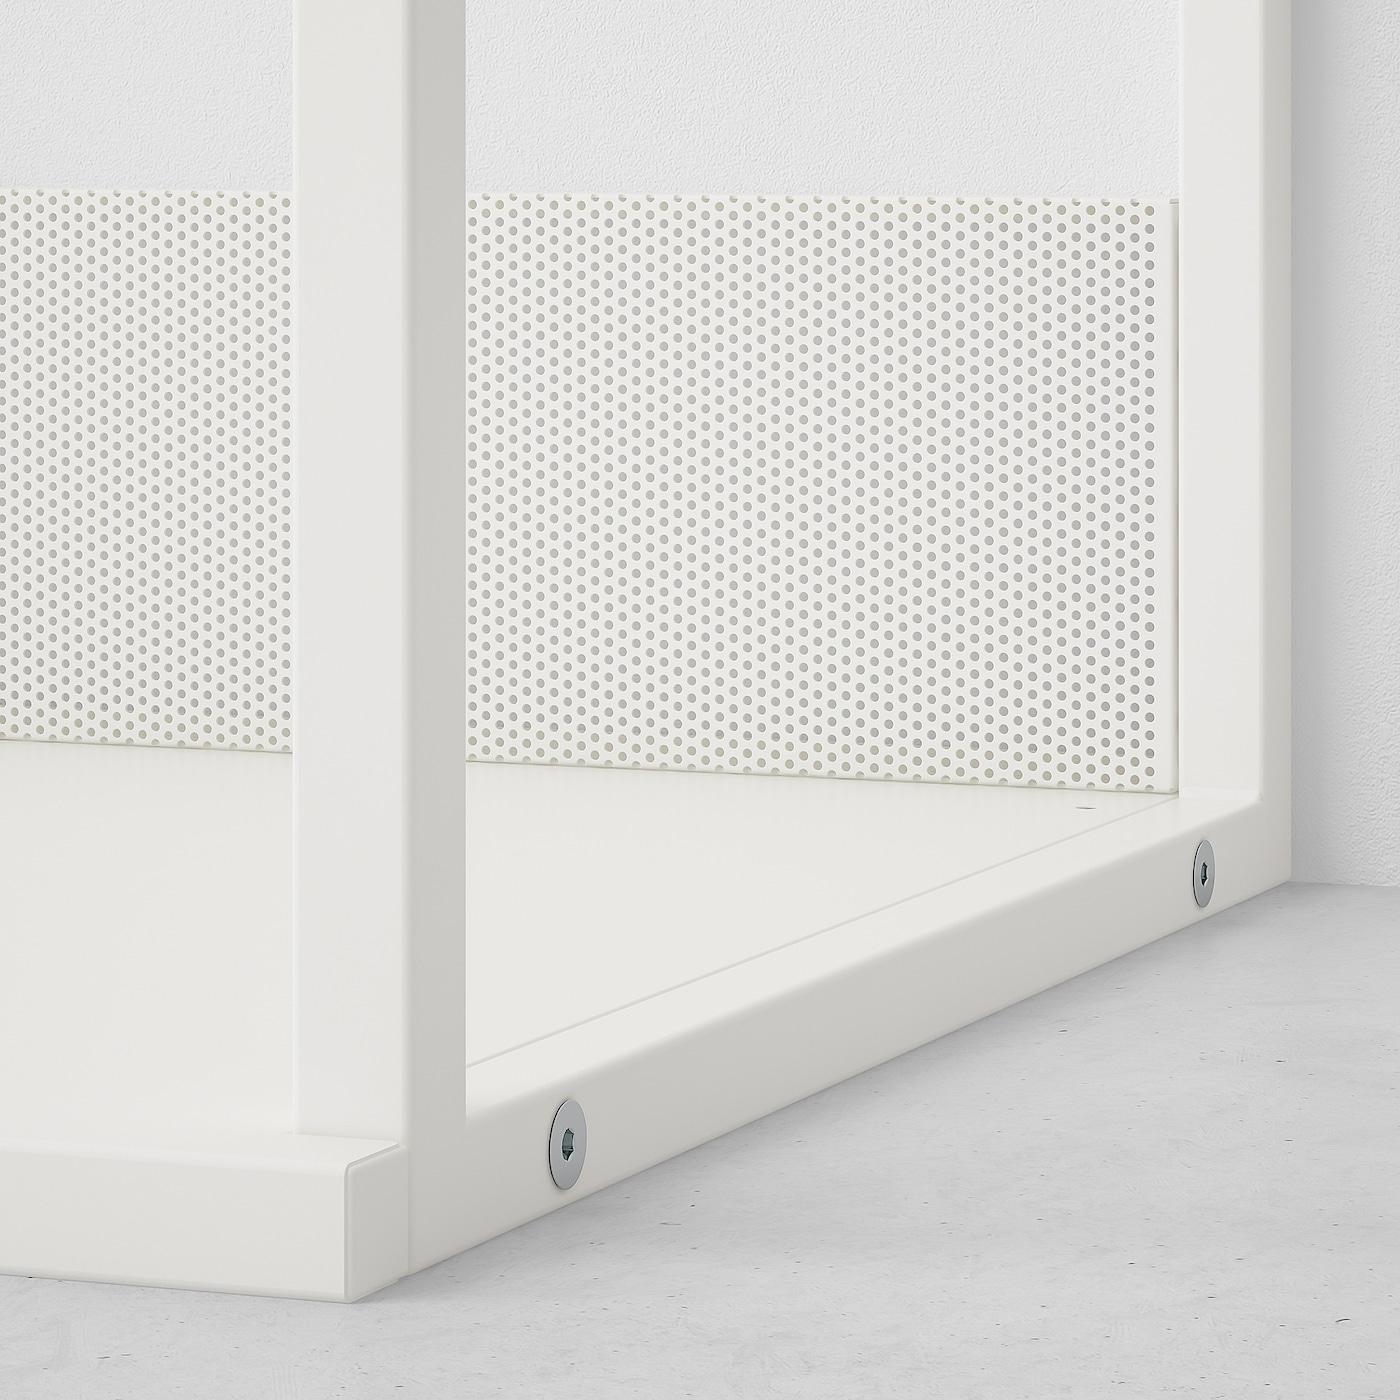 PLATSA Open shelving unit, white, 80x40x40 cm